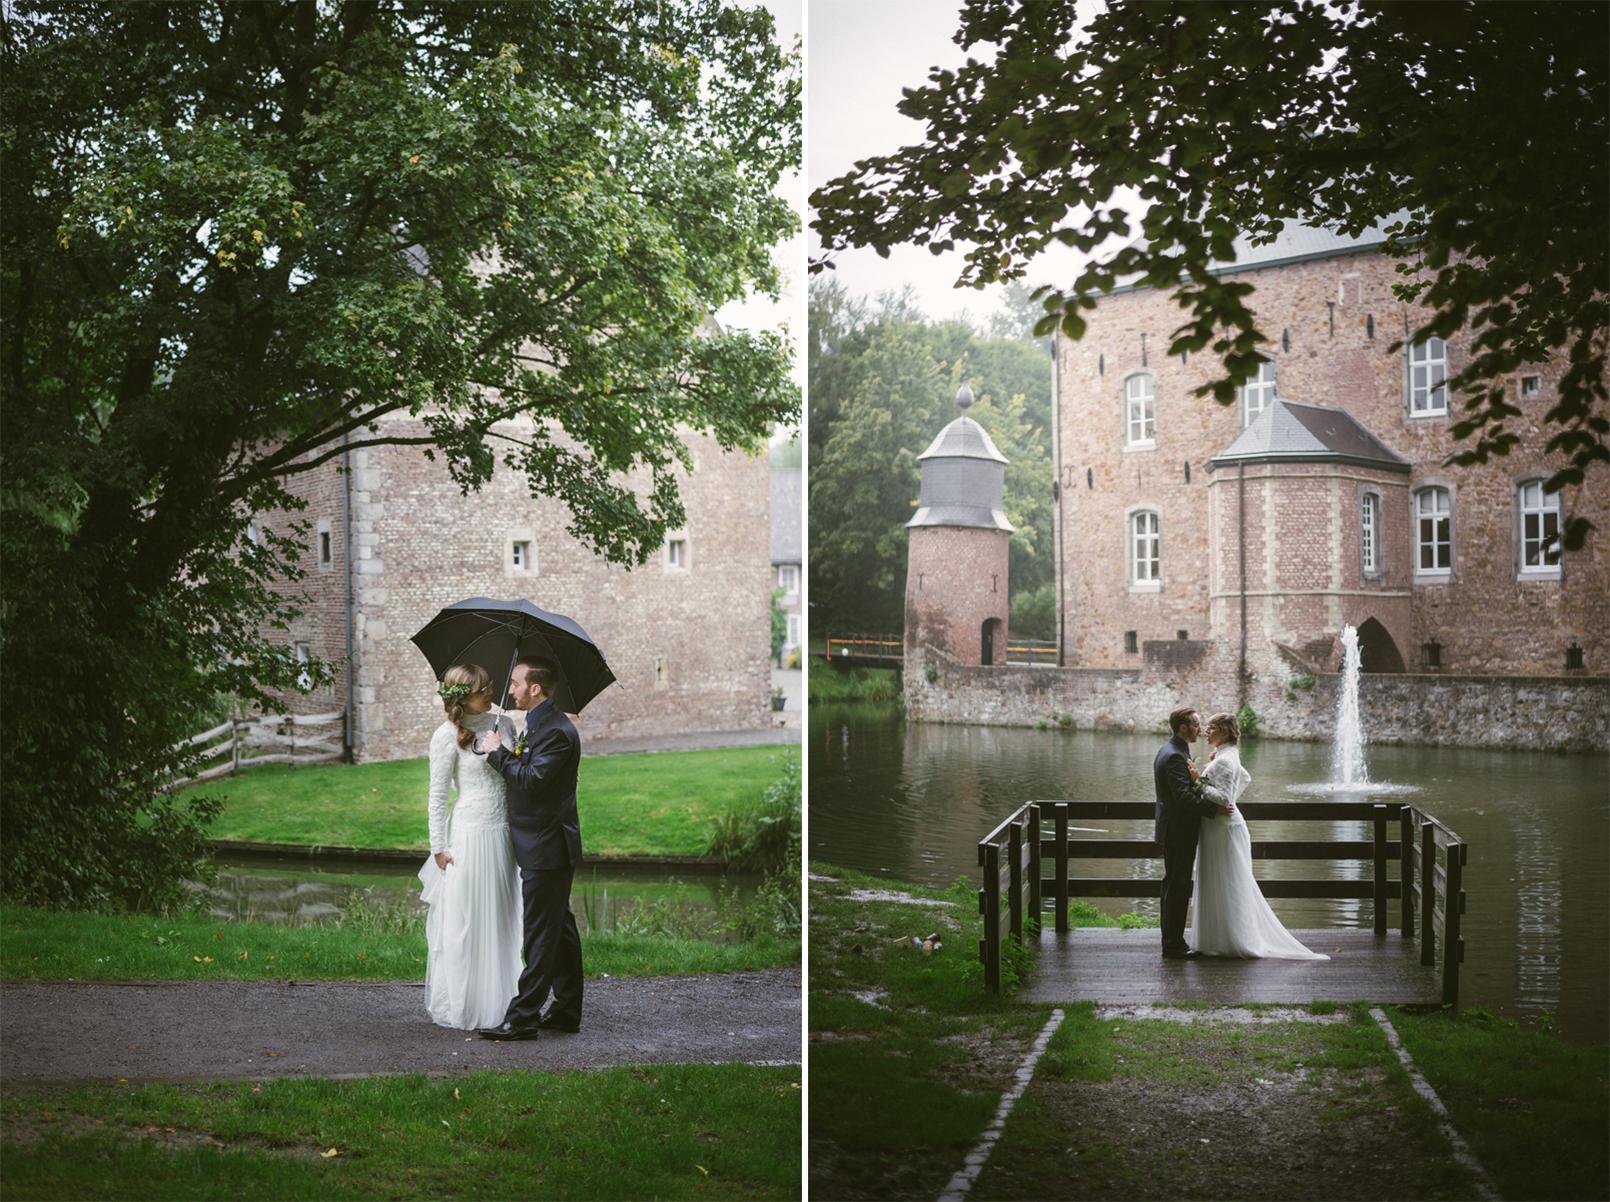 Hochzeitsfotografie-Aachen-Kerkrade-Herzogenrath-Fotografie-Dreamcatcher-0036